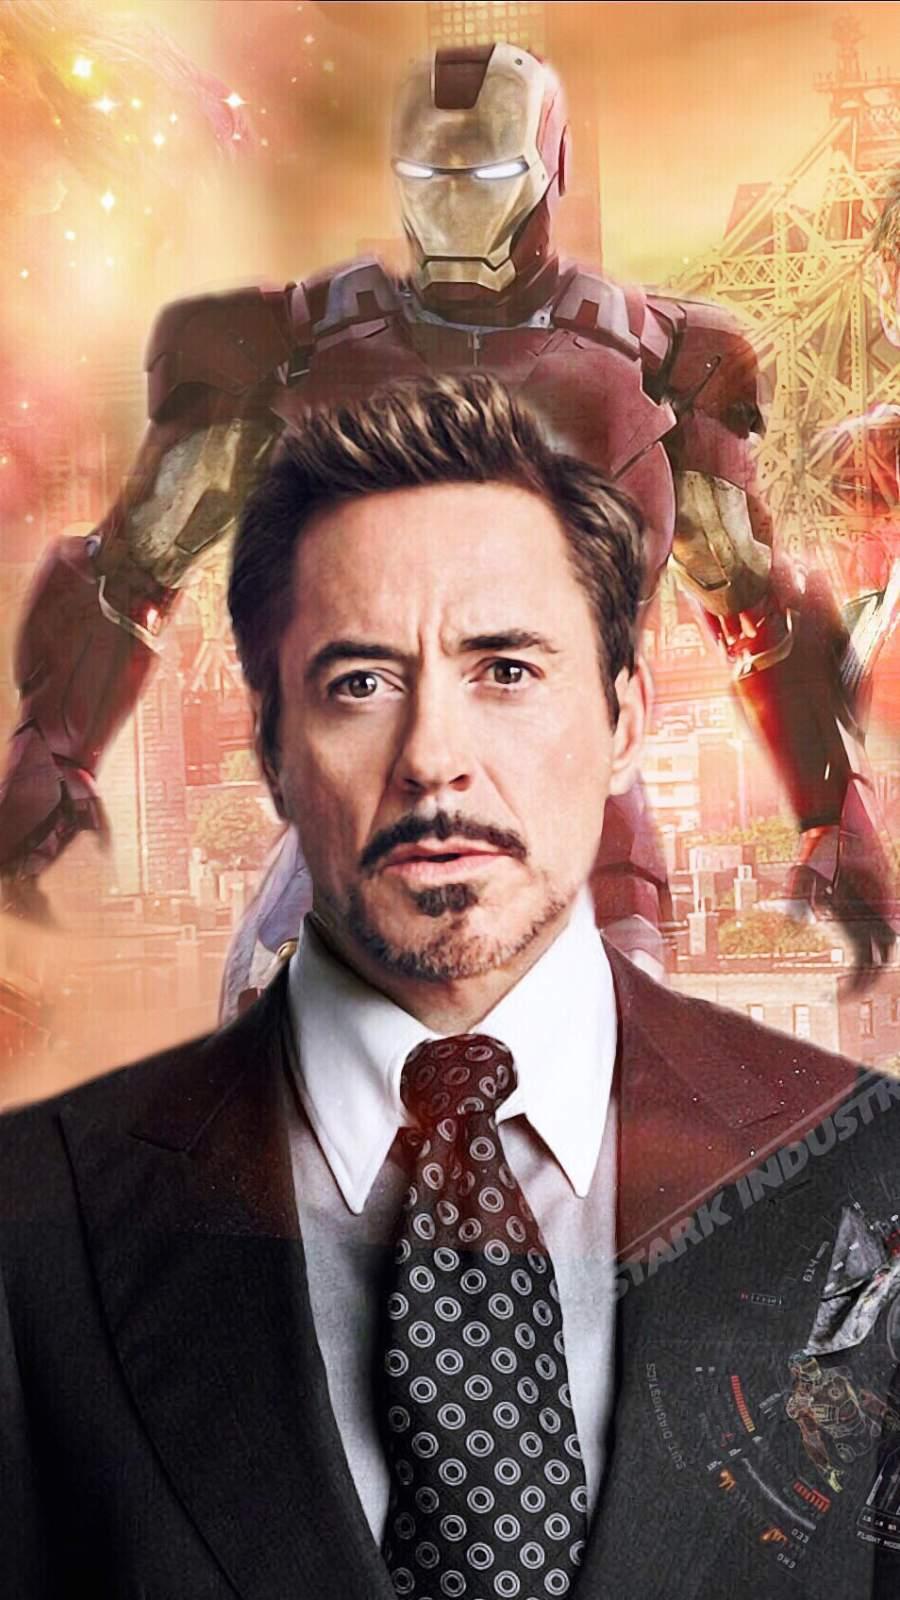 The Tony Stark Iron Man iPhone Wallpaper